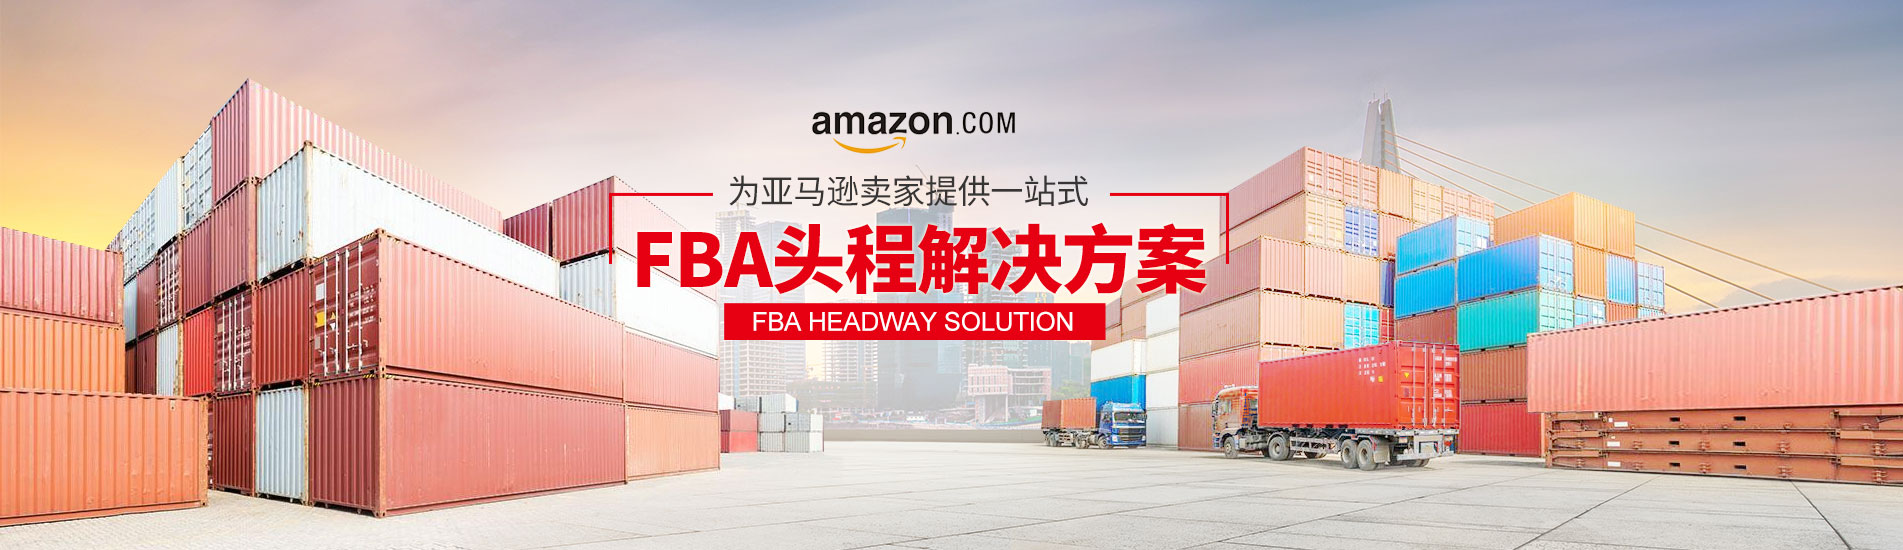 FBA头程解决方案